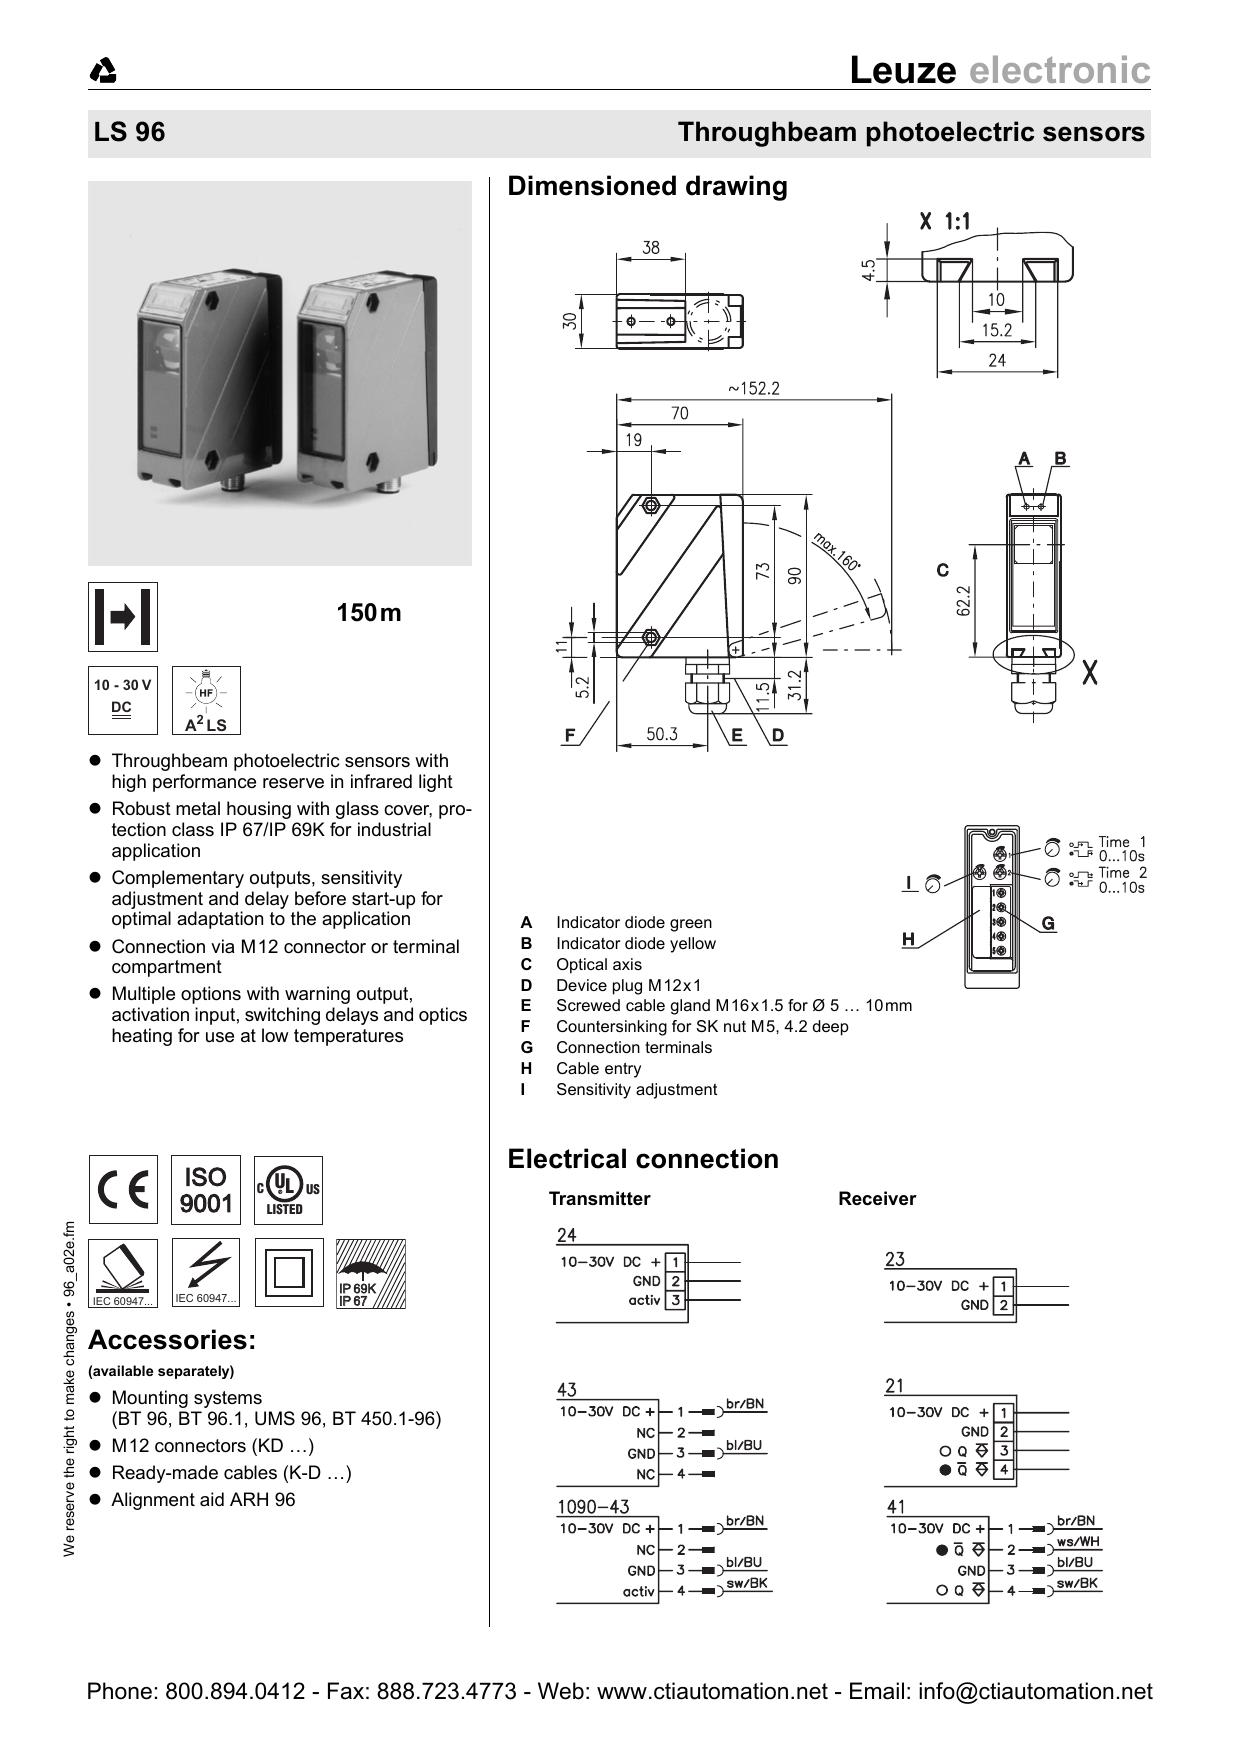 Leuze LS 96 Throughbeam Photoelectric Sensors | manualzz com